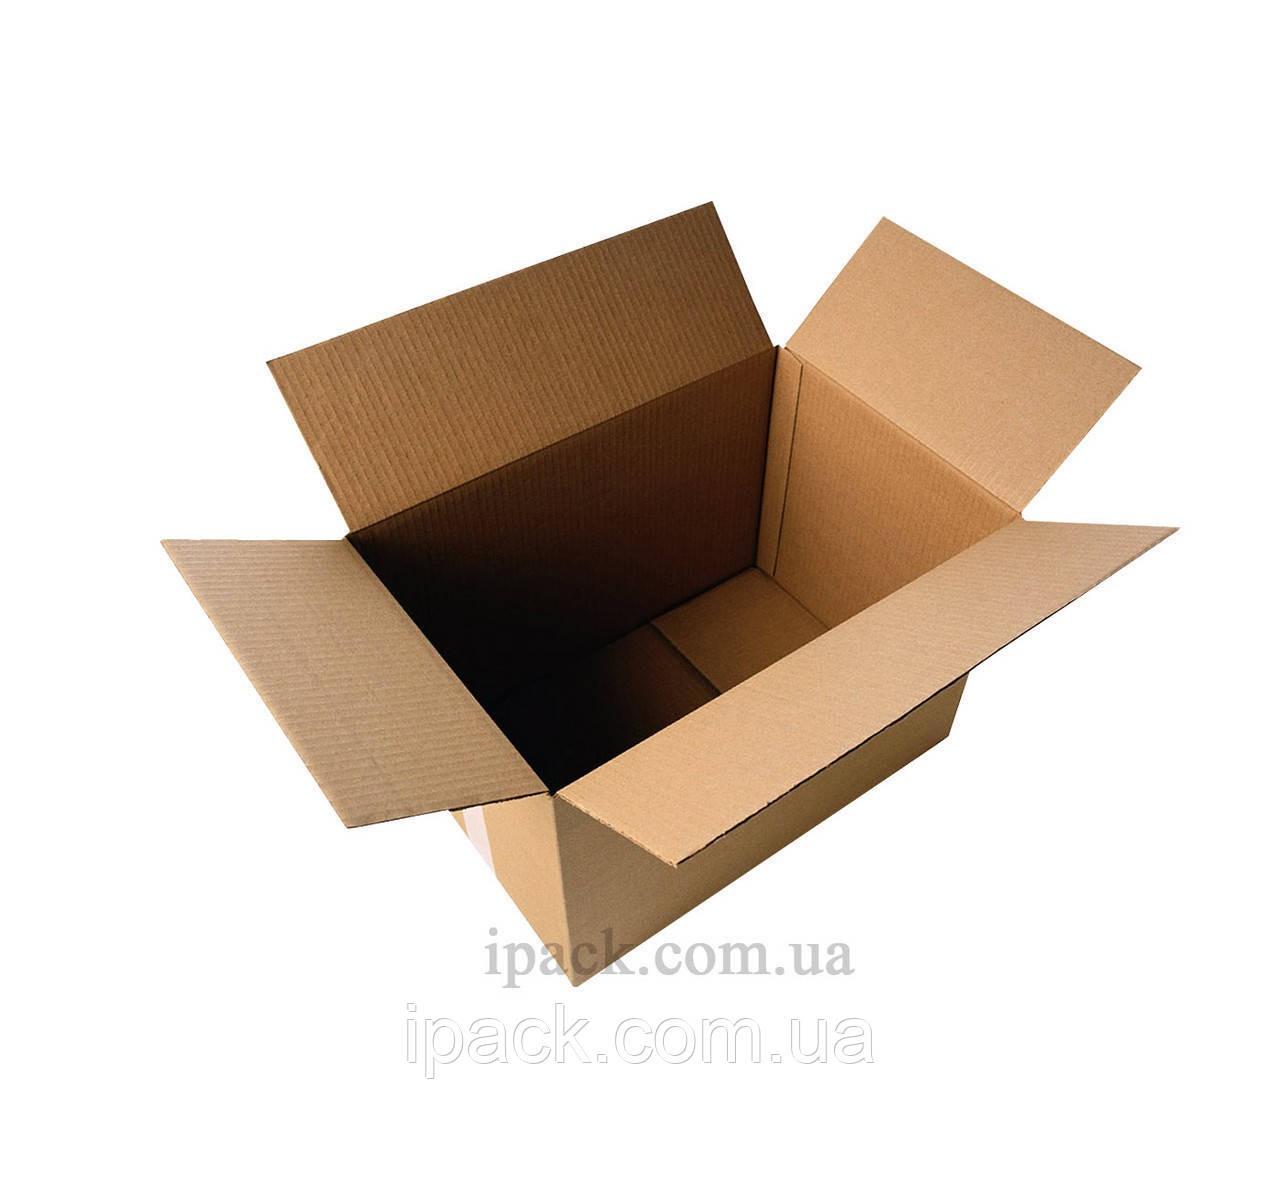 Гофроящик 298*227*234 мм, бурый, четырехклапанный картонный короб